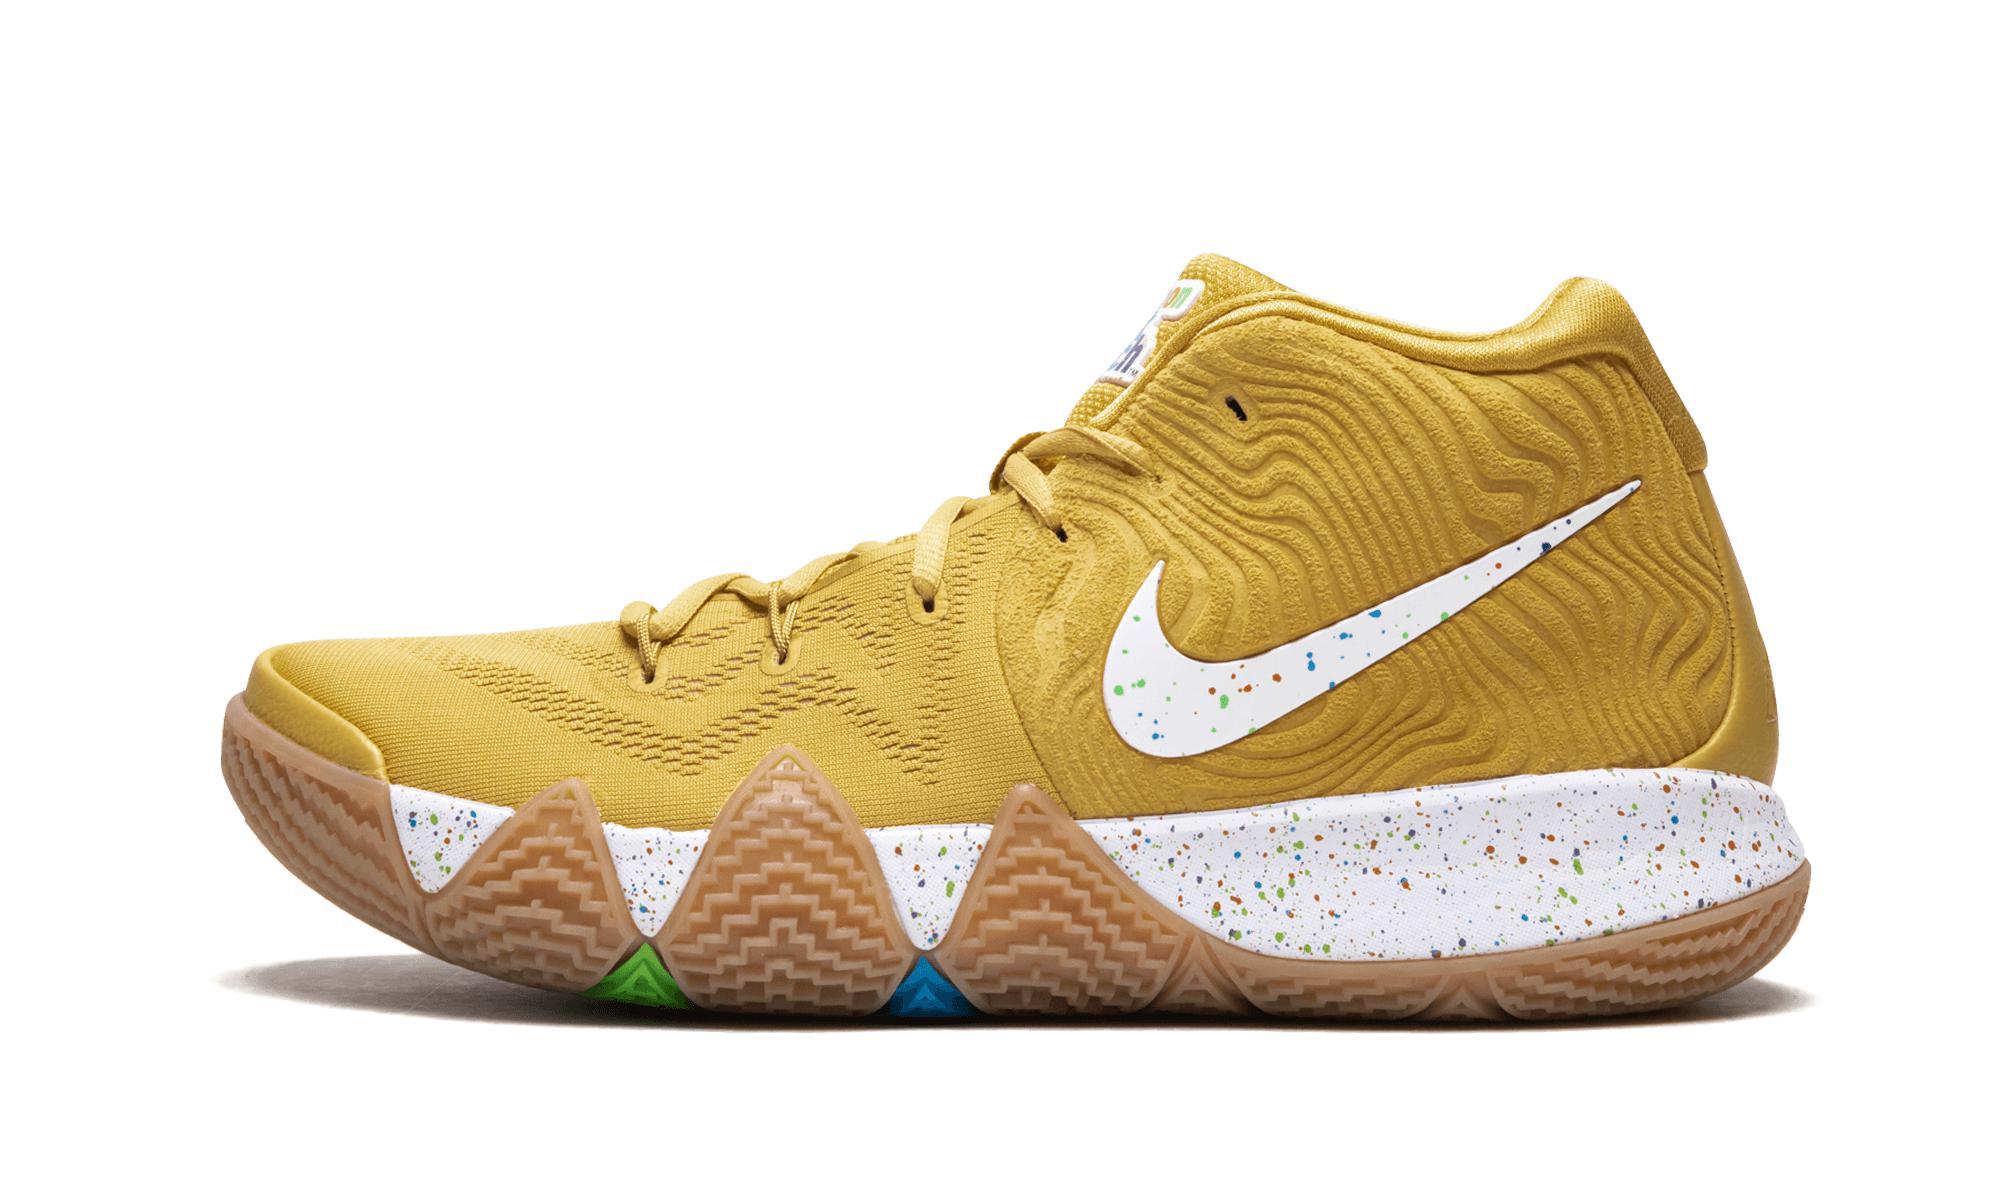 Nike Kyrie 4 Ctc in Metallic for Men - Lyst 006c639b2